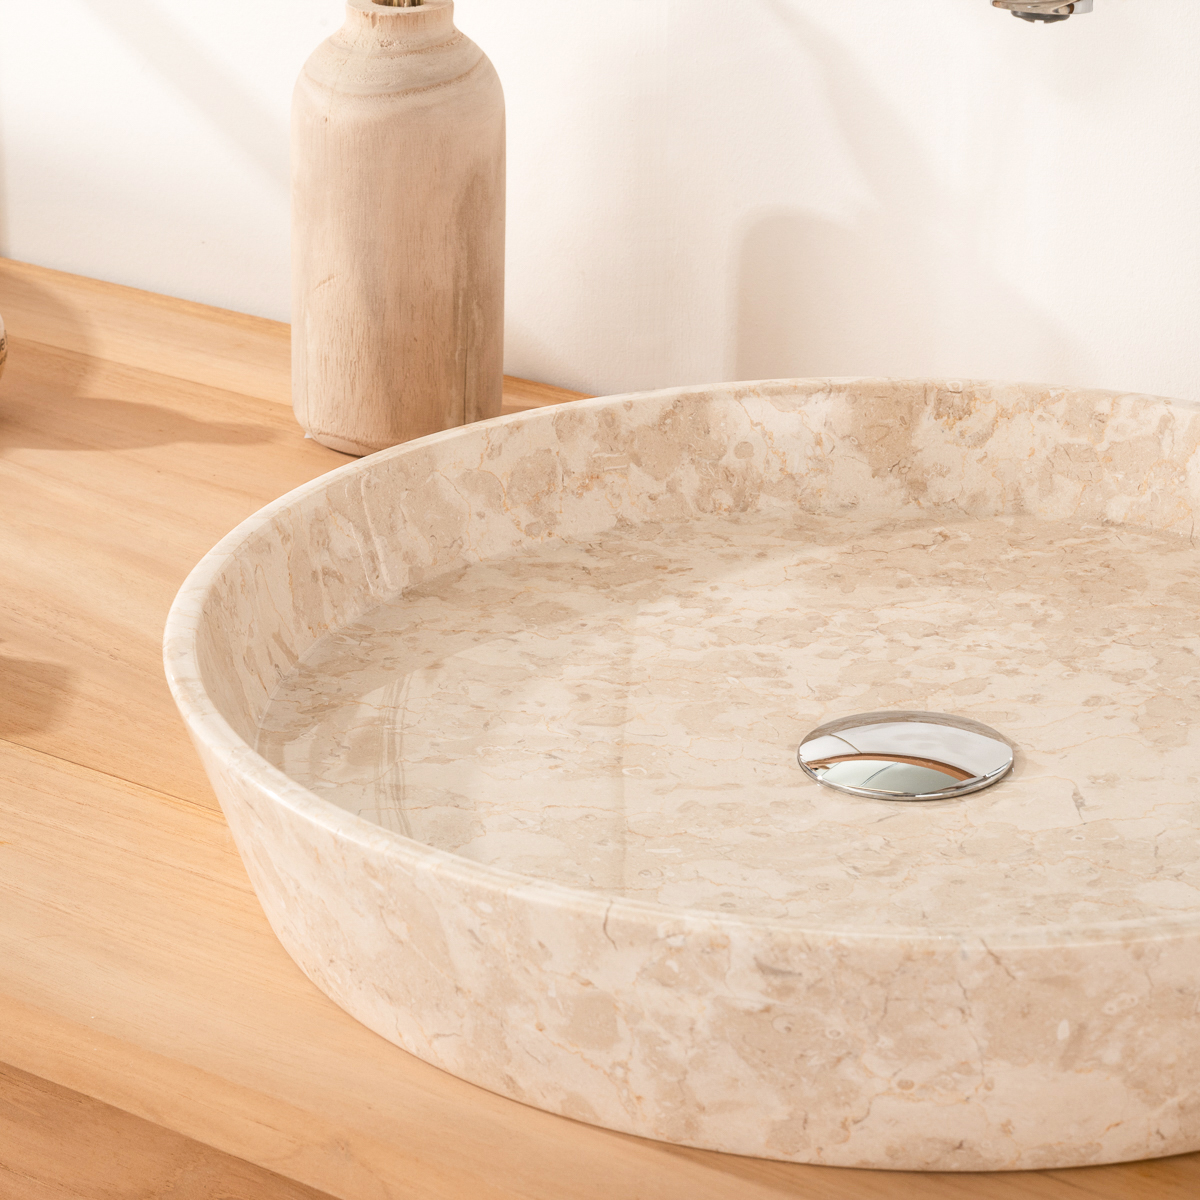 vasque en marbre poser salle de bain malo cr me. Black Bedroom Furniture Sets. Home Design Ideas